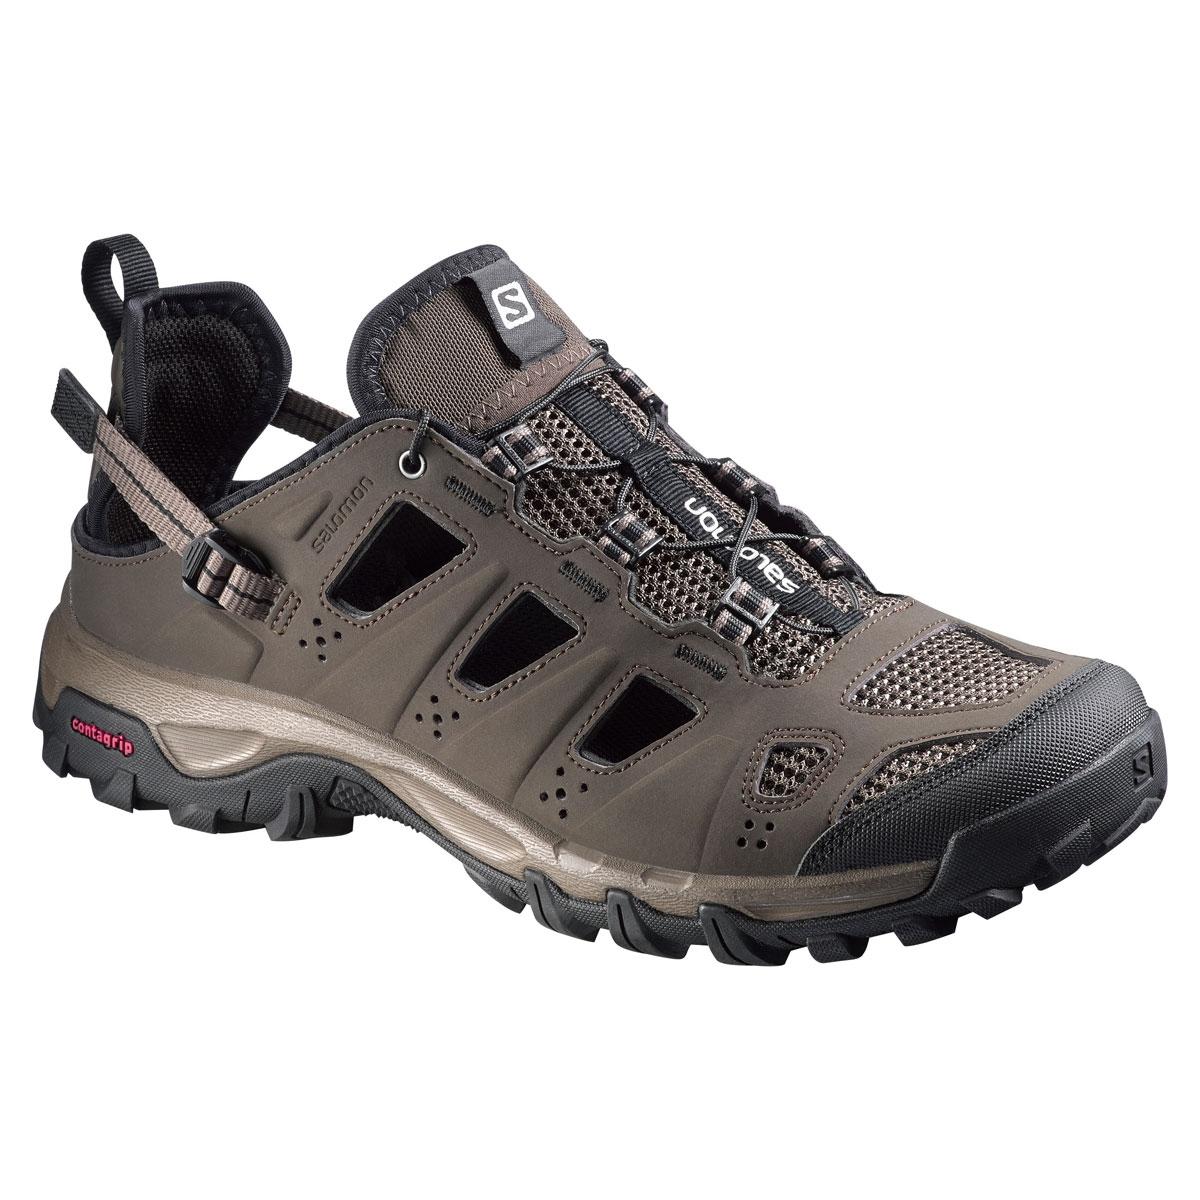 Salomon EVASION CABRIO - Walking sandals - absolute brown-x/burro/black KqK5wFHlE